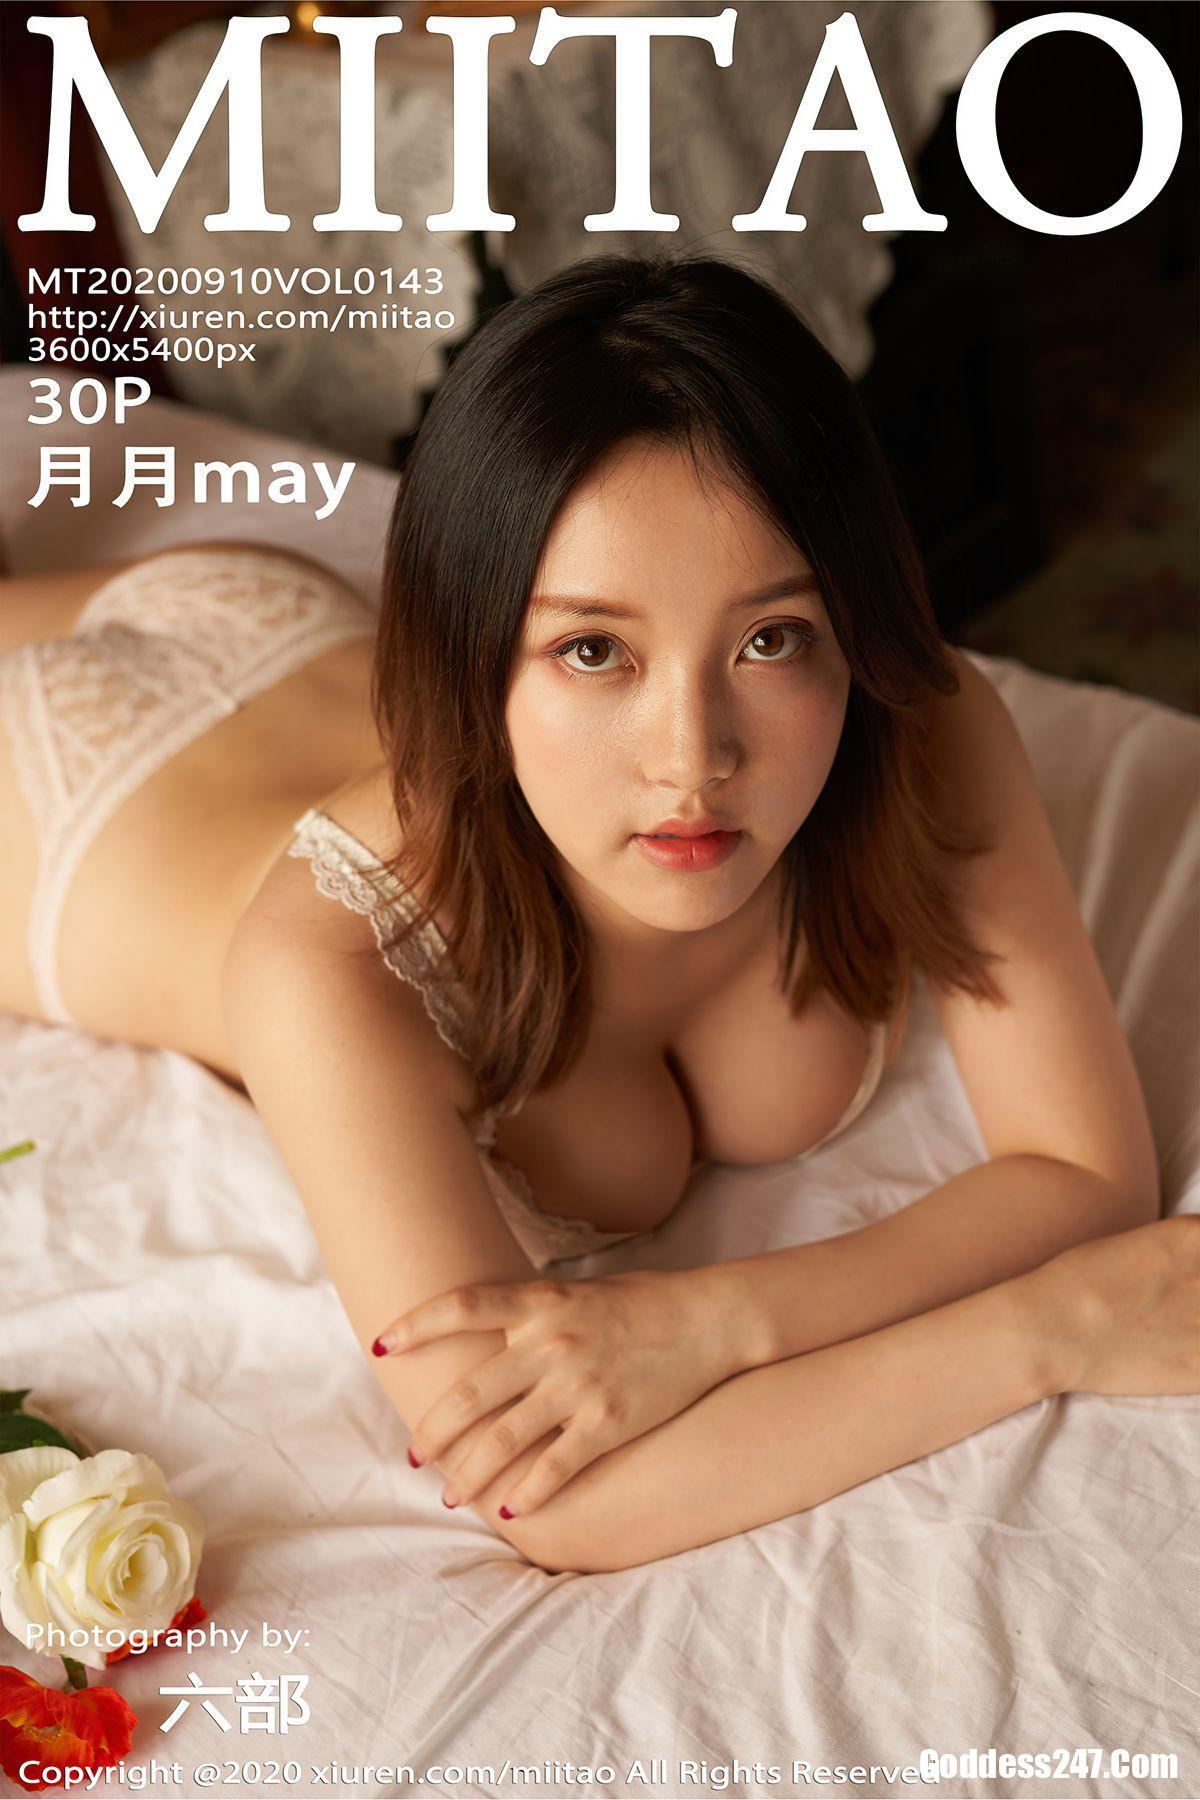 MiiTao Vol.143 月月may